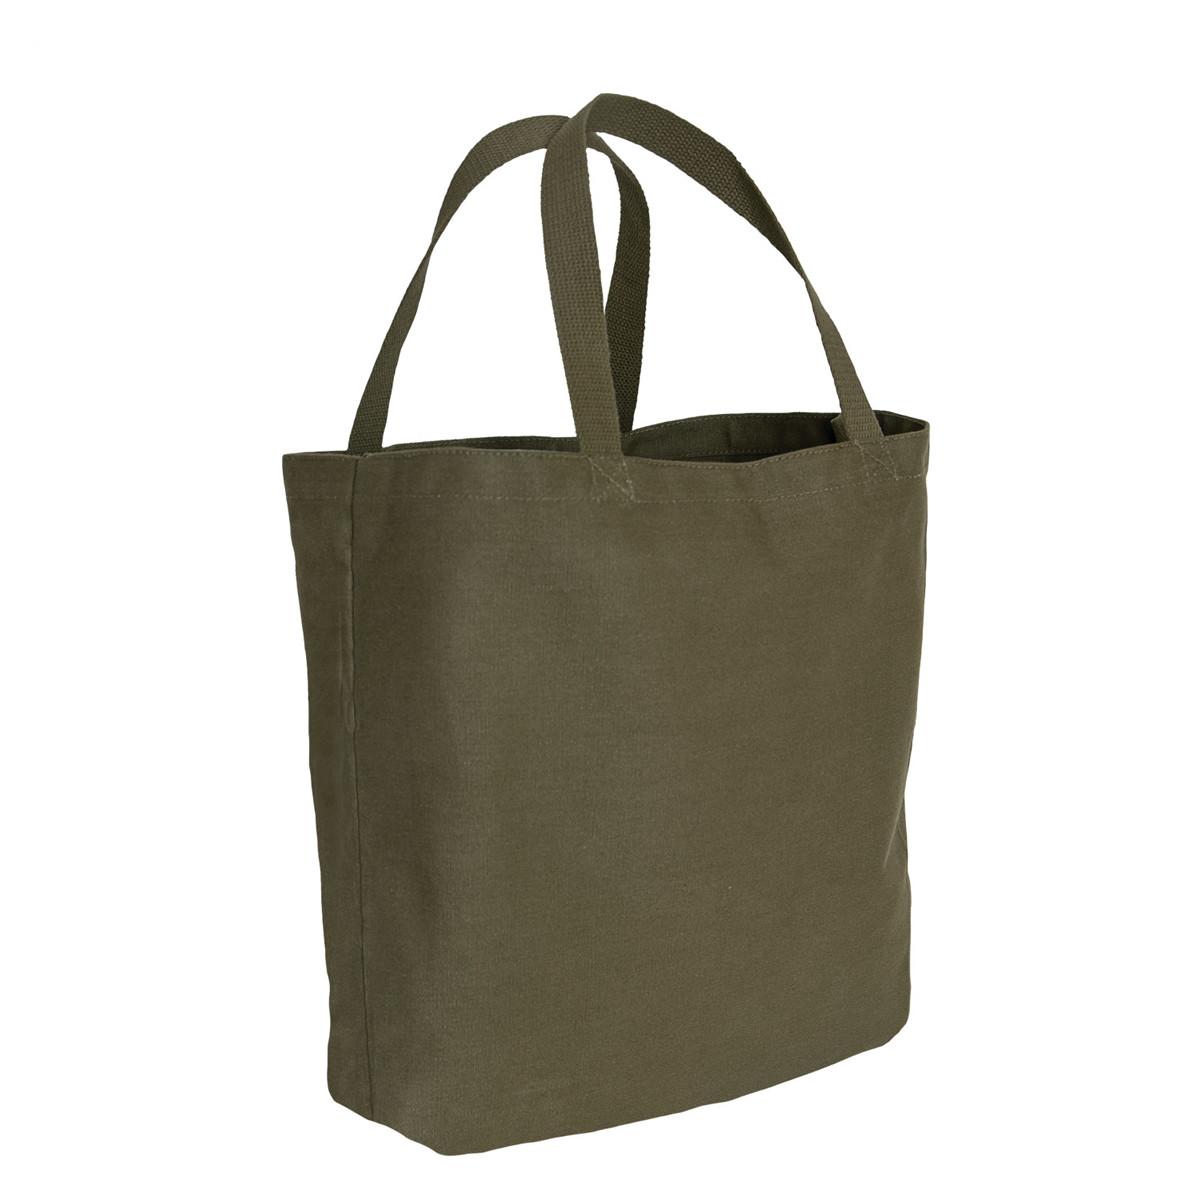 YINLAN Foldable Multifunctional Waterproof Duffel Travel Storage Bag Chaming Pastel Mermaid Lightweight Large Capacity Portable Luggage Bag